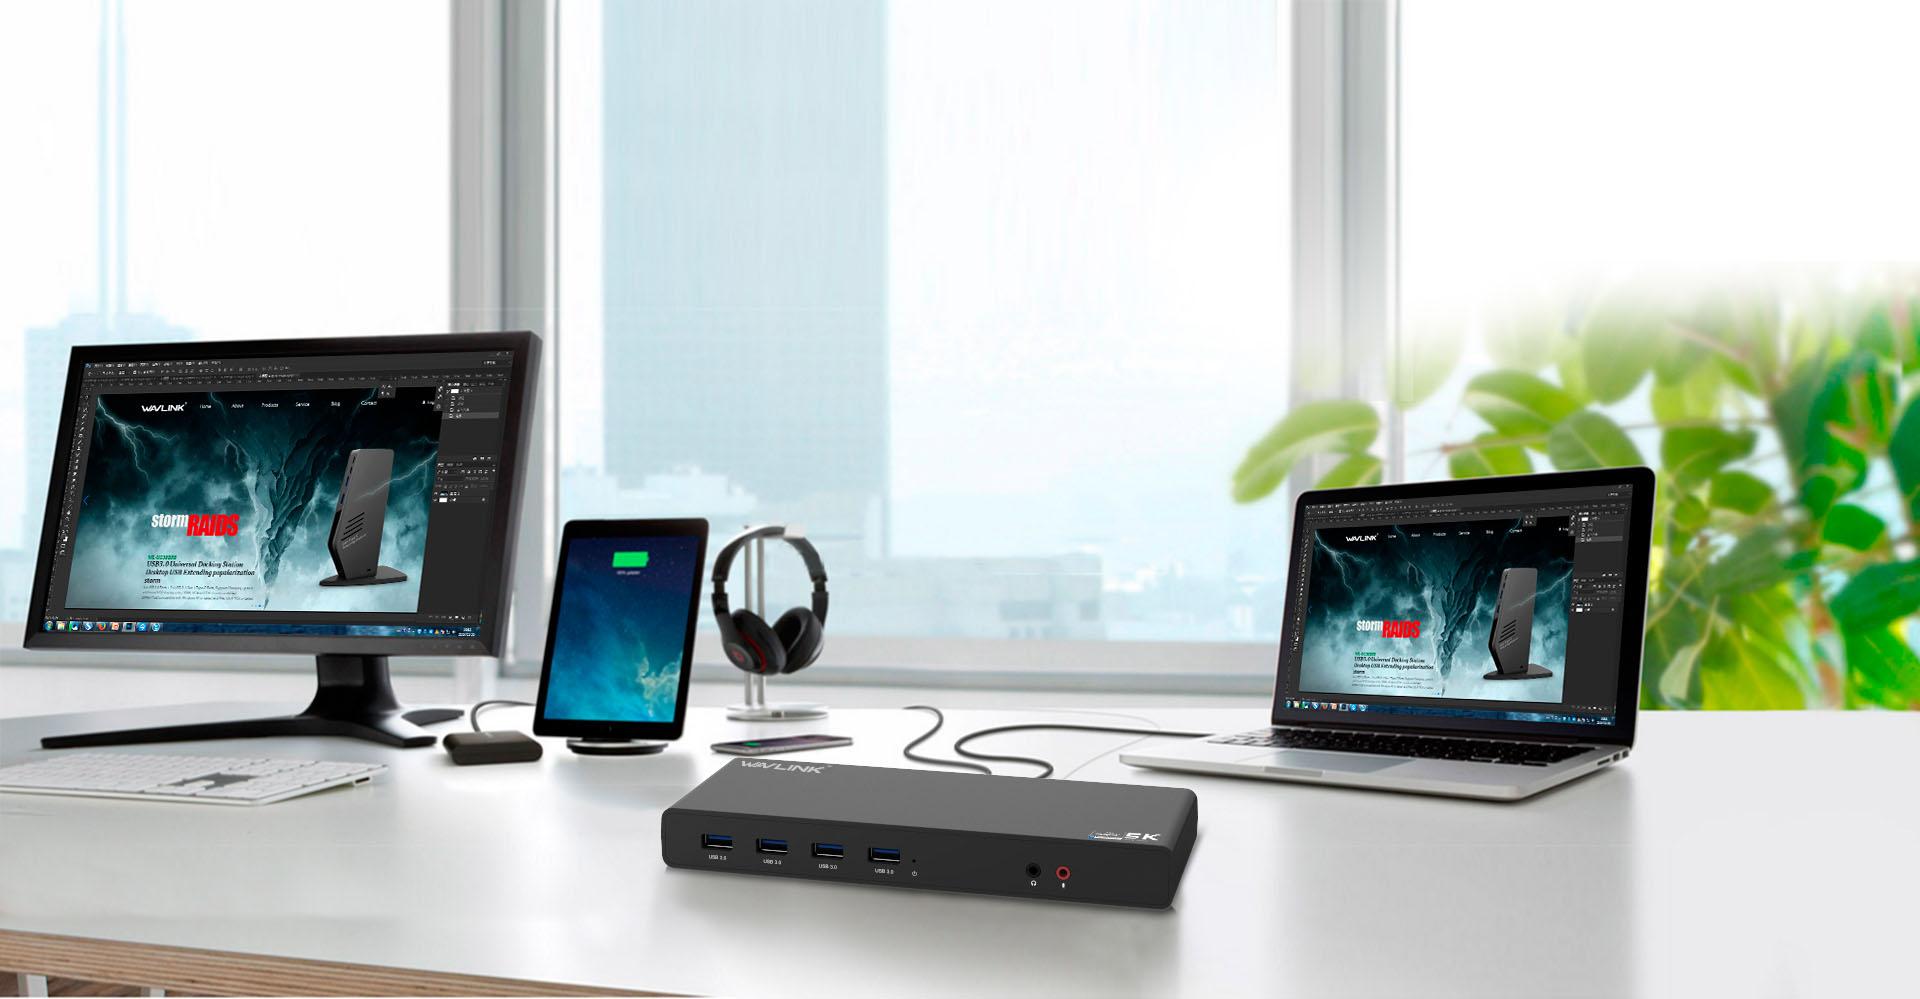 WAVLINK USB UNIVERSAL DOCKING STATION USB-C IN DUAL 4K UG69DK1 1 4